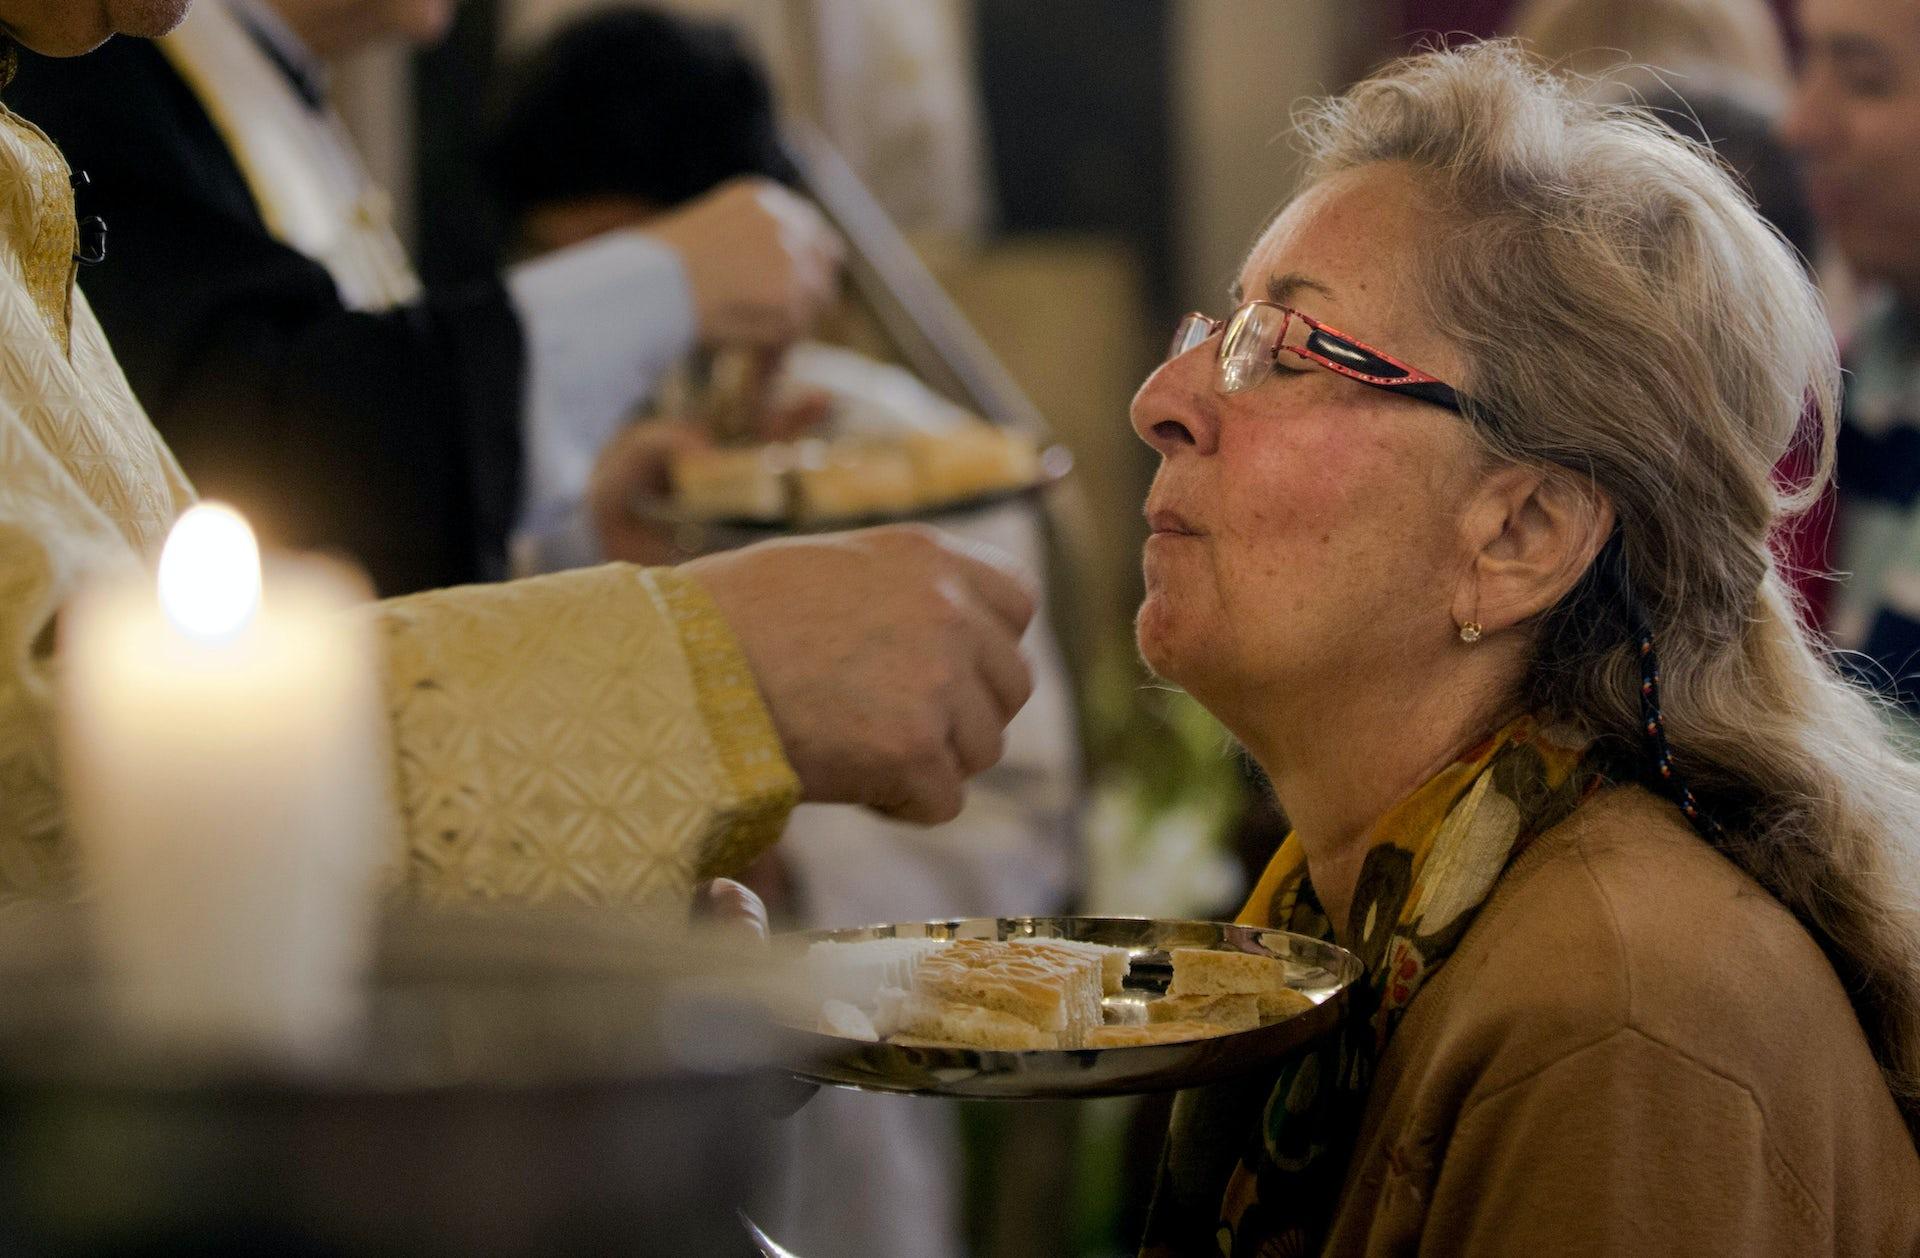 Catholic church view on online hookup